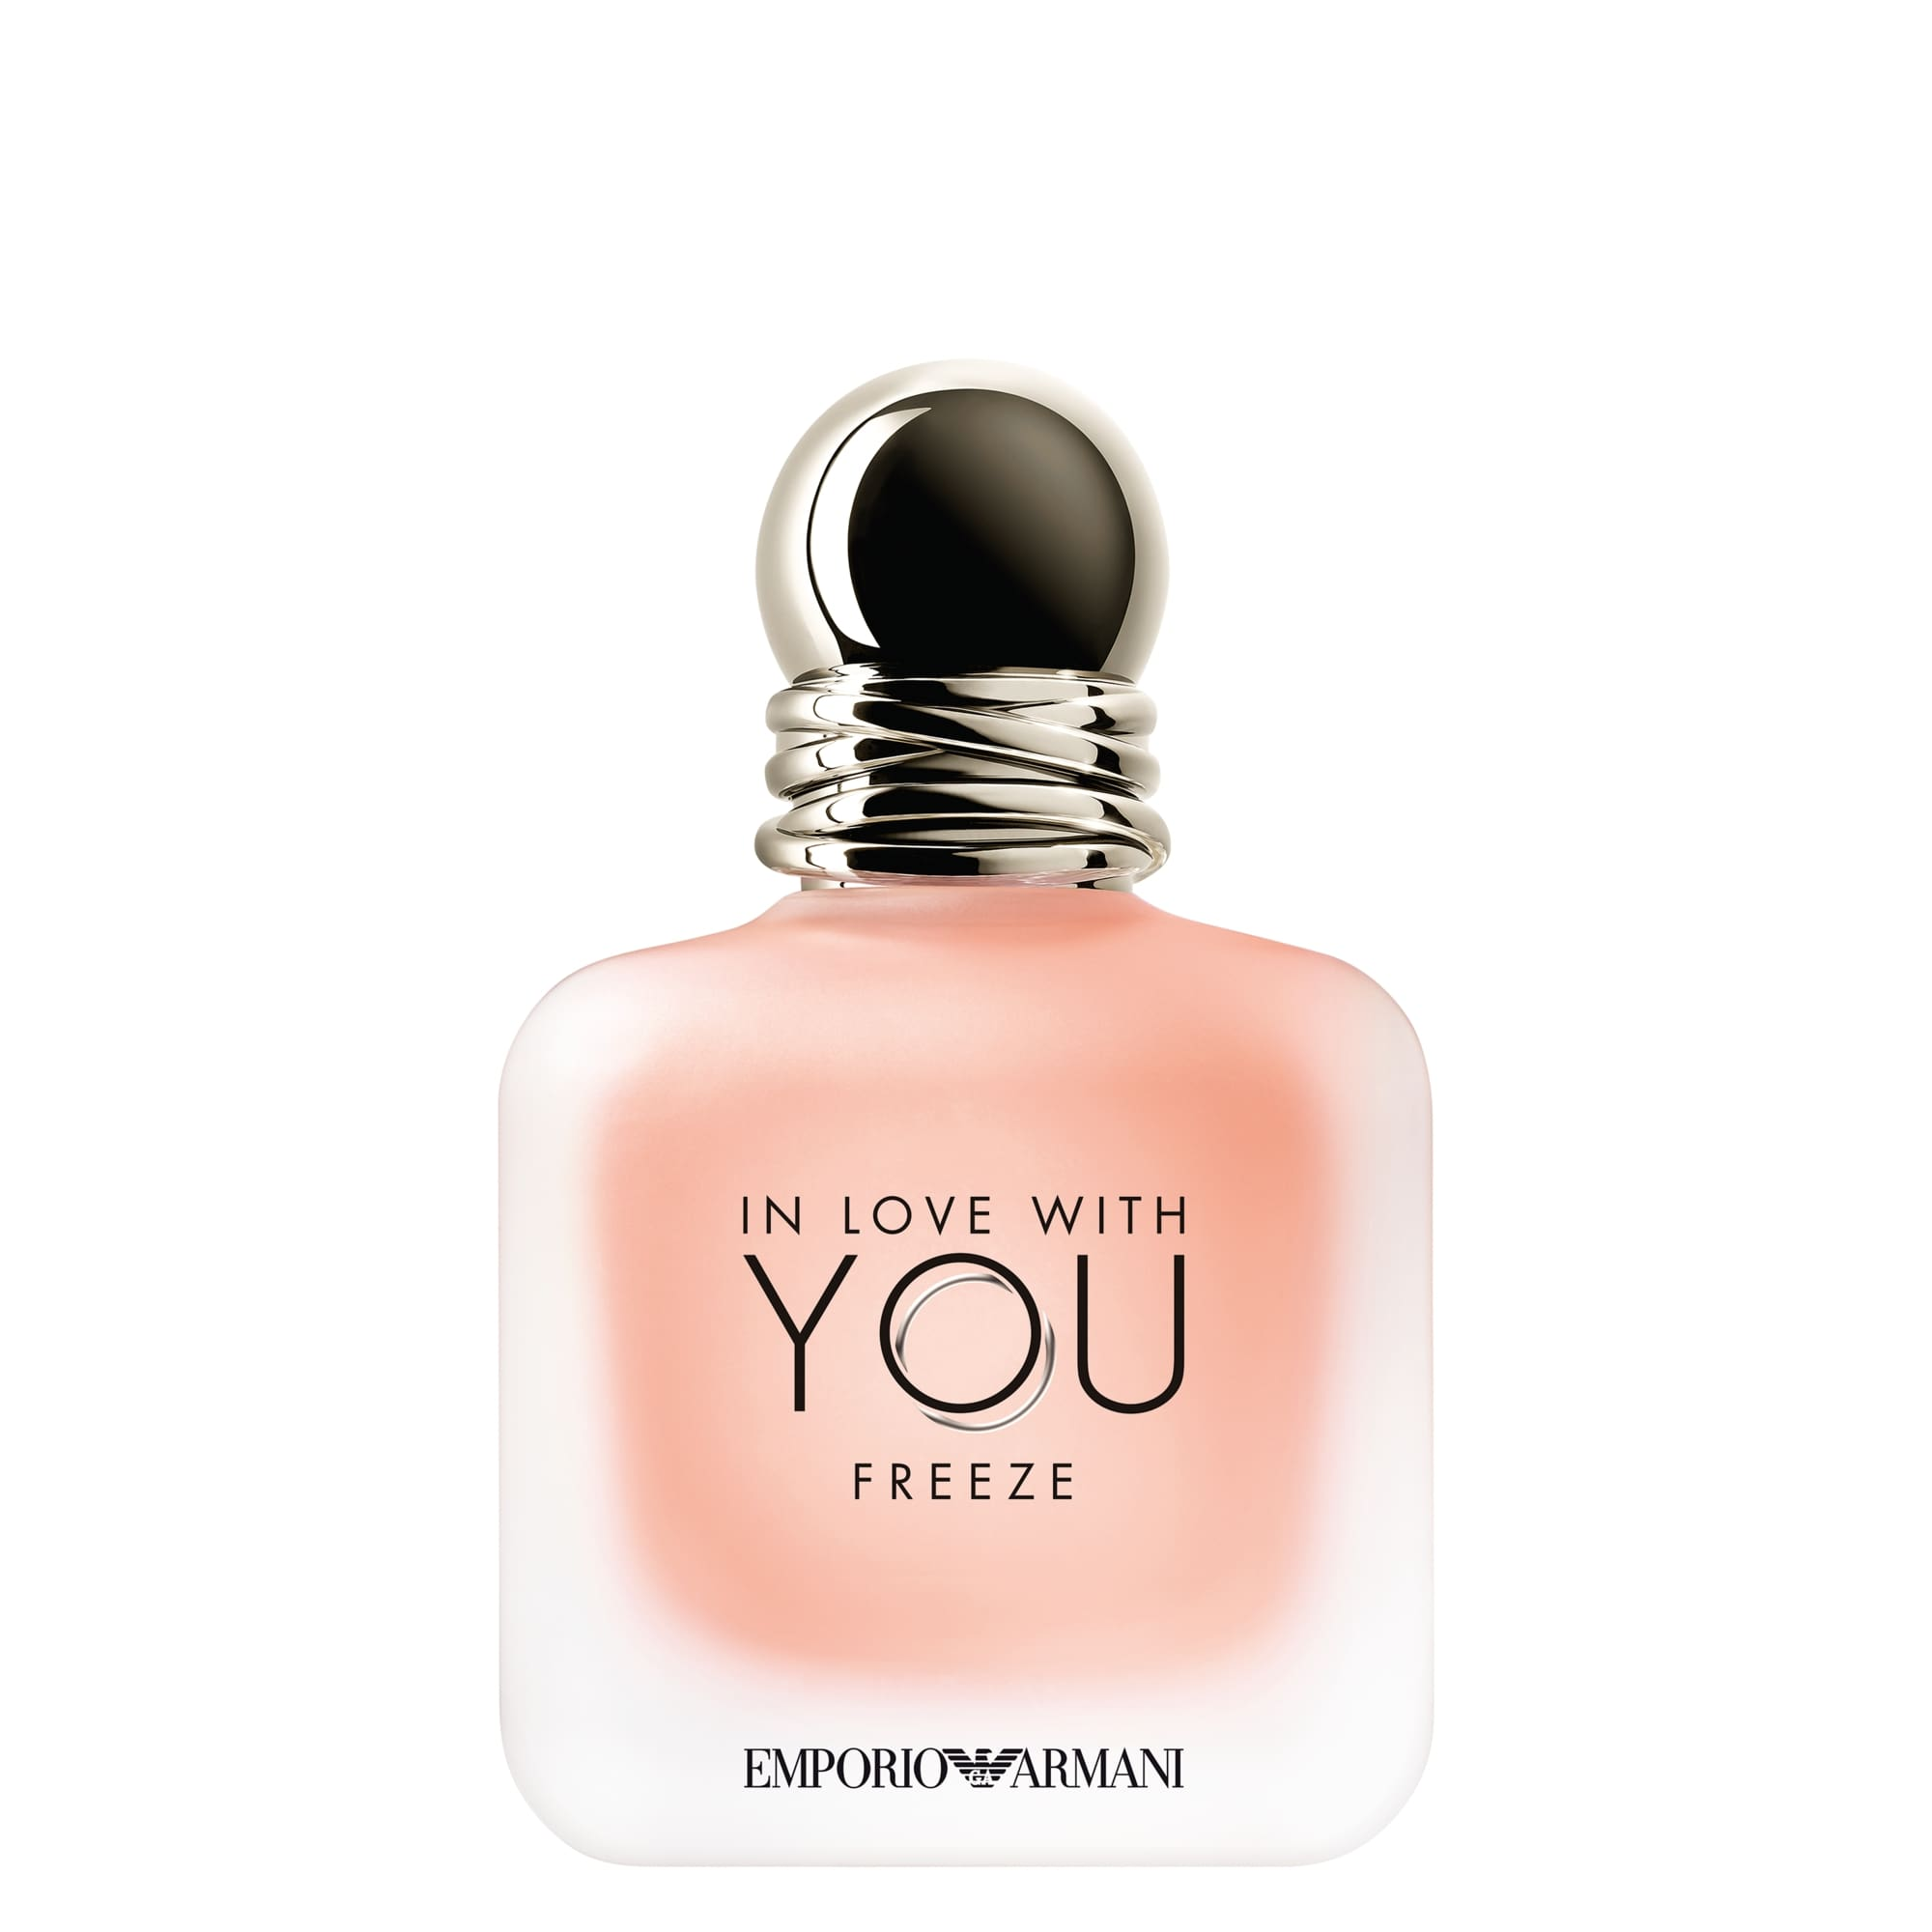 Giorgio Armani In Love With You Freeze EDP, 50 ml